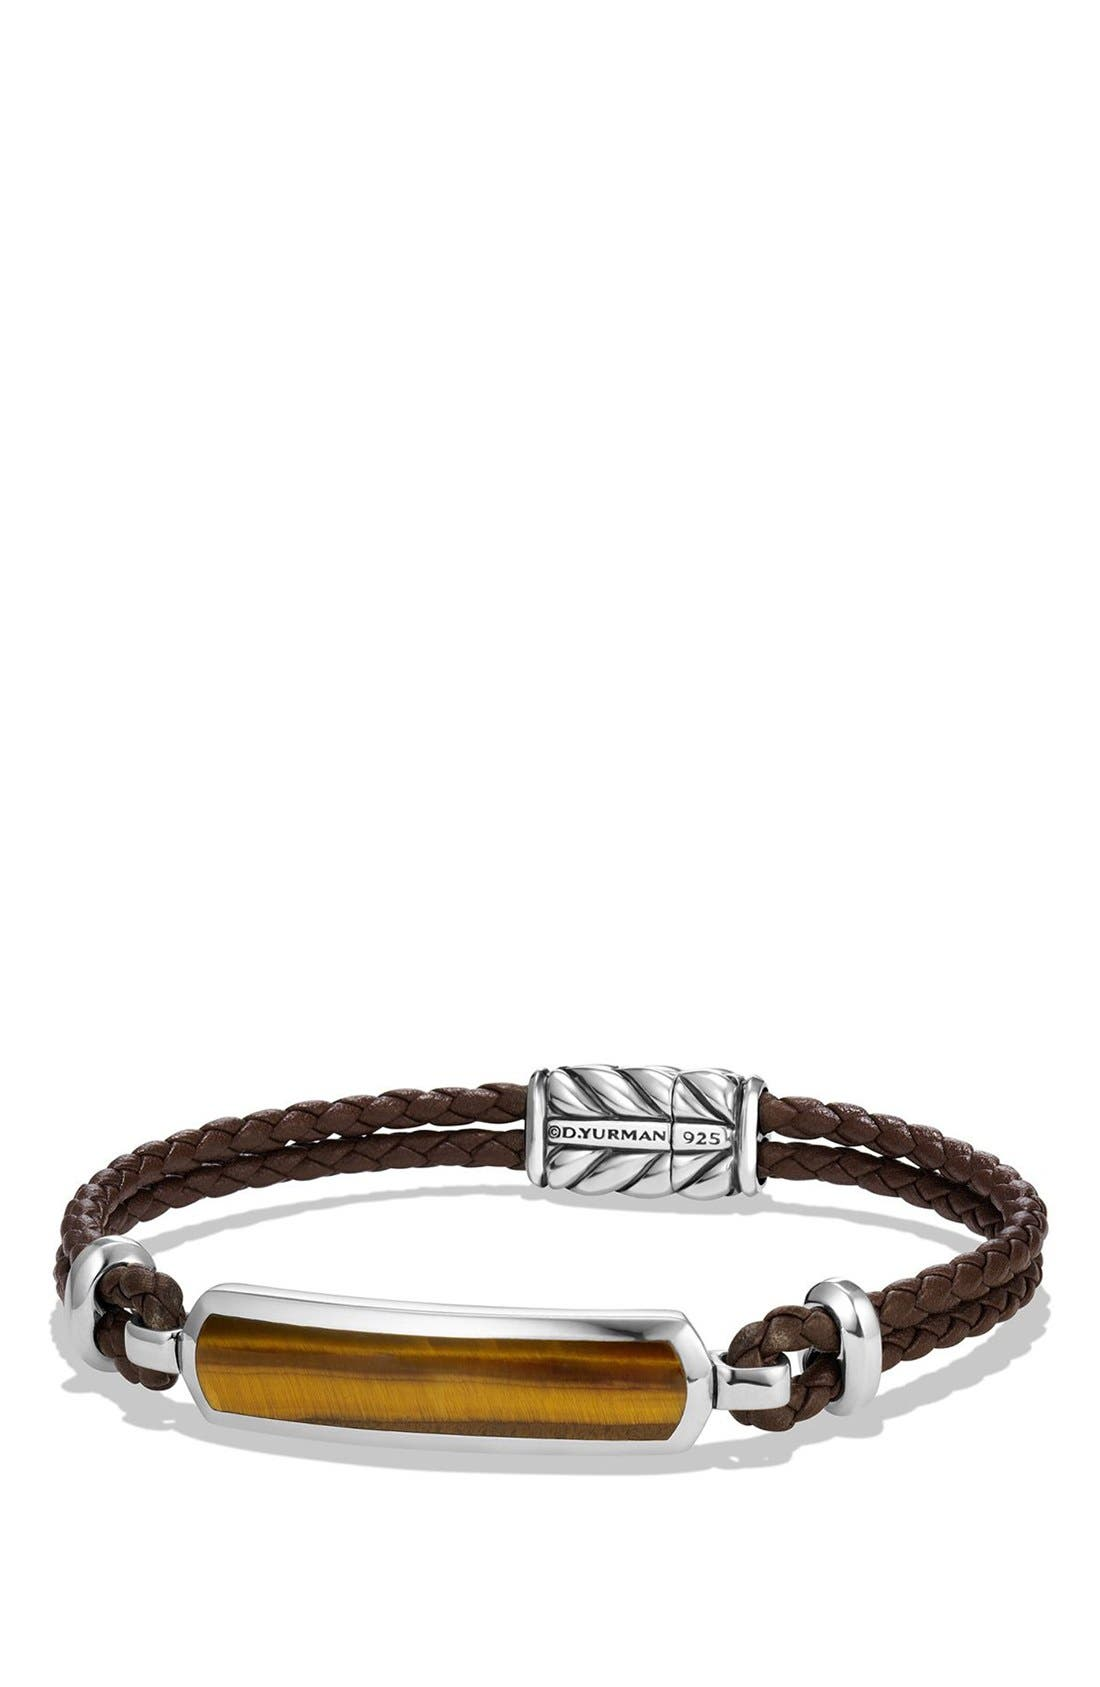 Bar Station Leather Bracelet,                             Main thumbnail 1, color,                             SILVER/ TIGERS EYE